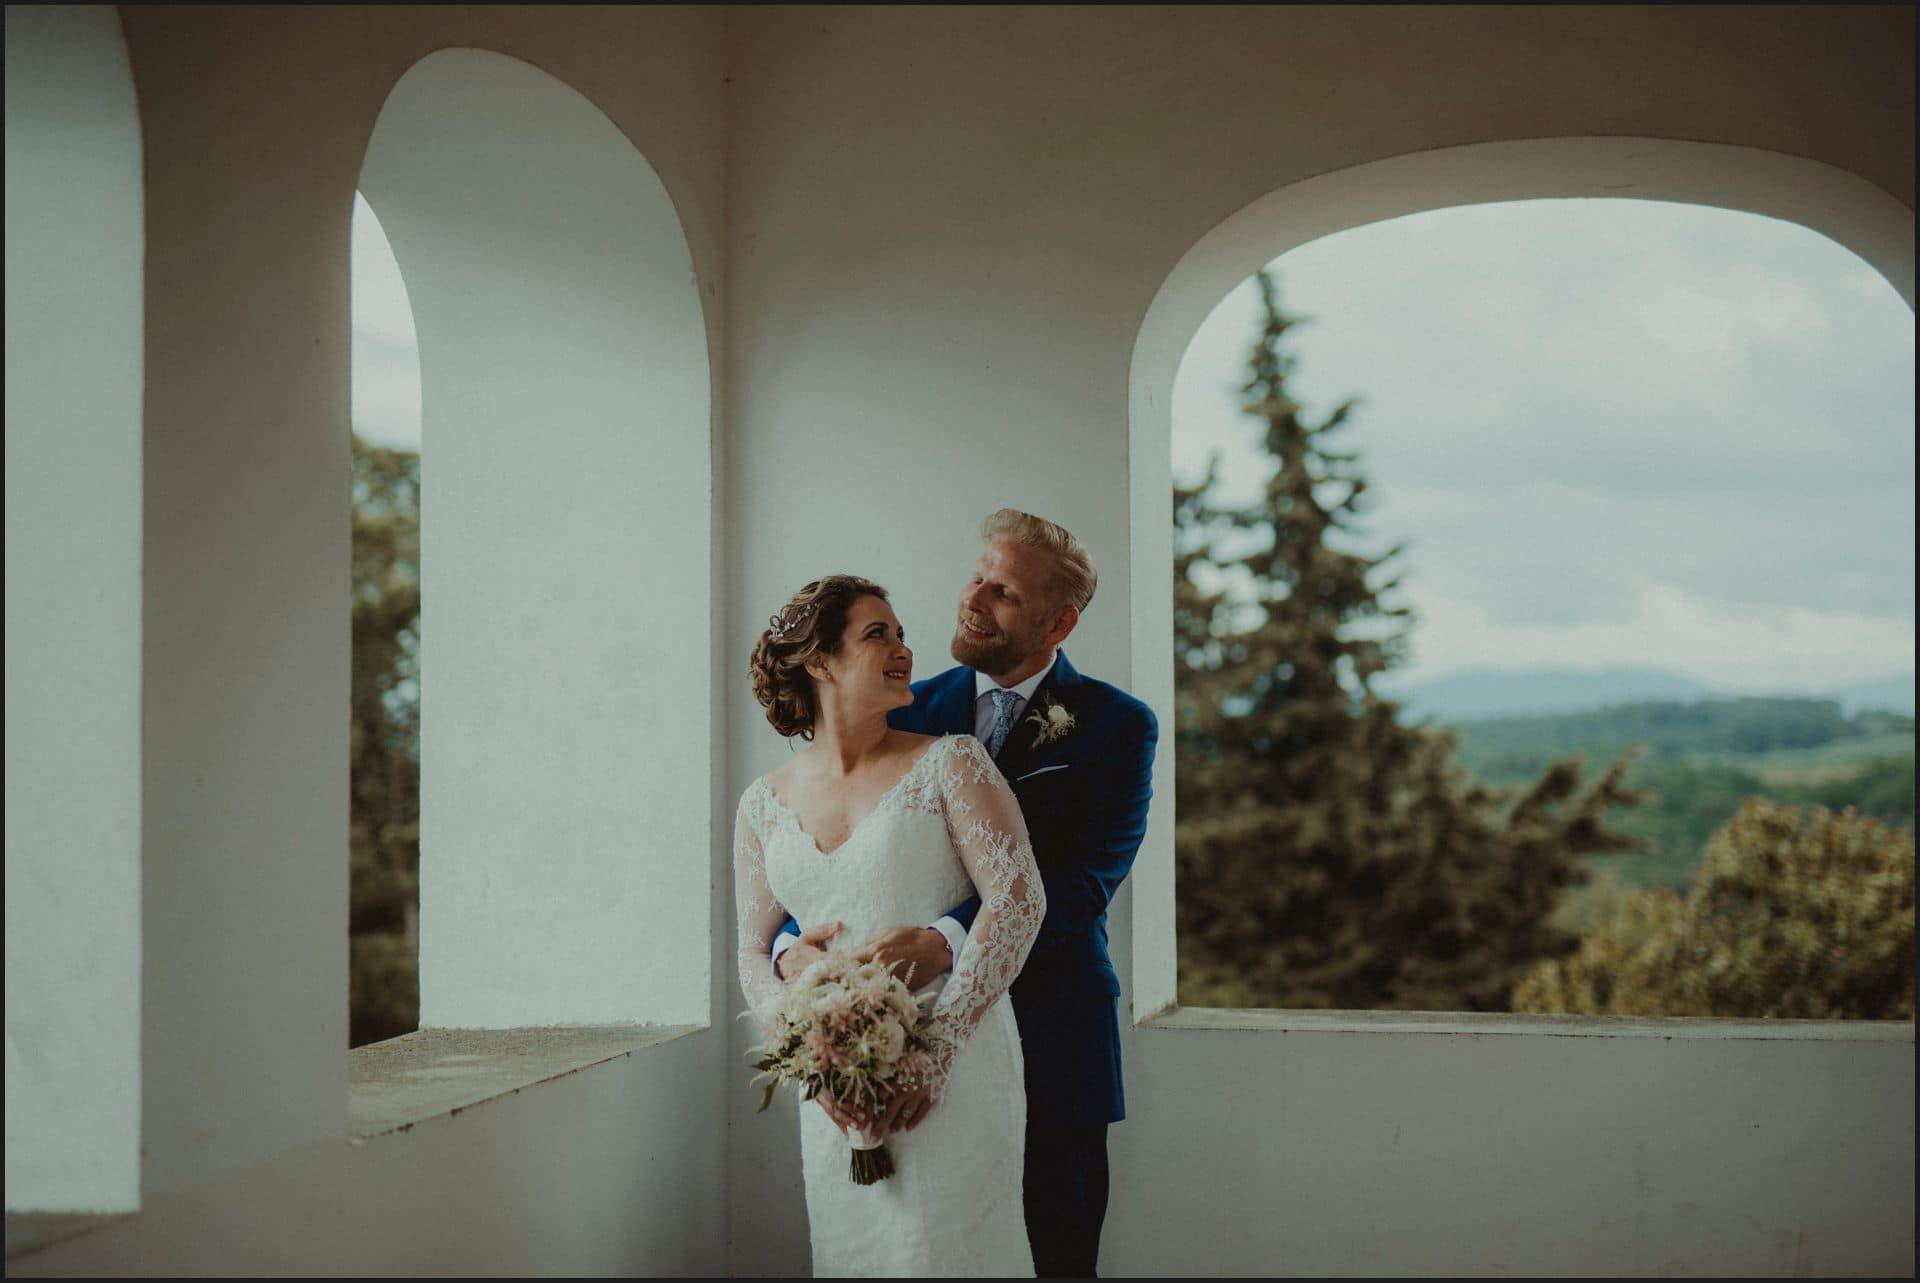 tuscany, destination wedding, chianti, bride, groom, intimate, portrait